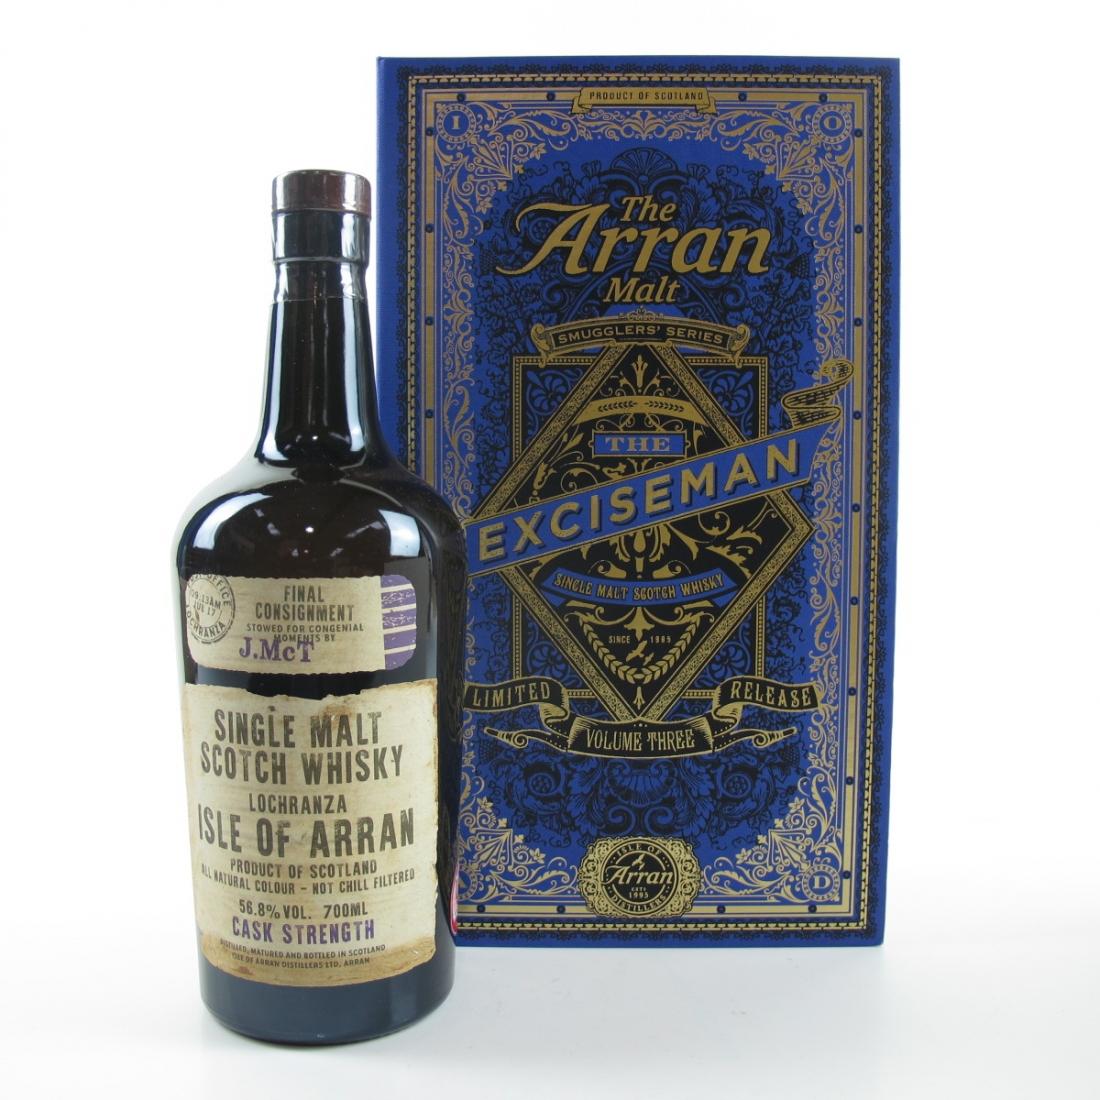 Arran Smugglers' Series Volume 3 / The Exciseman